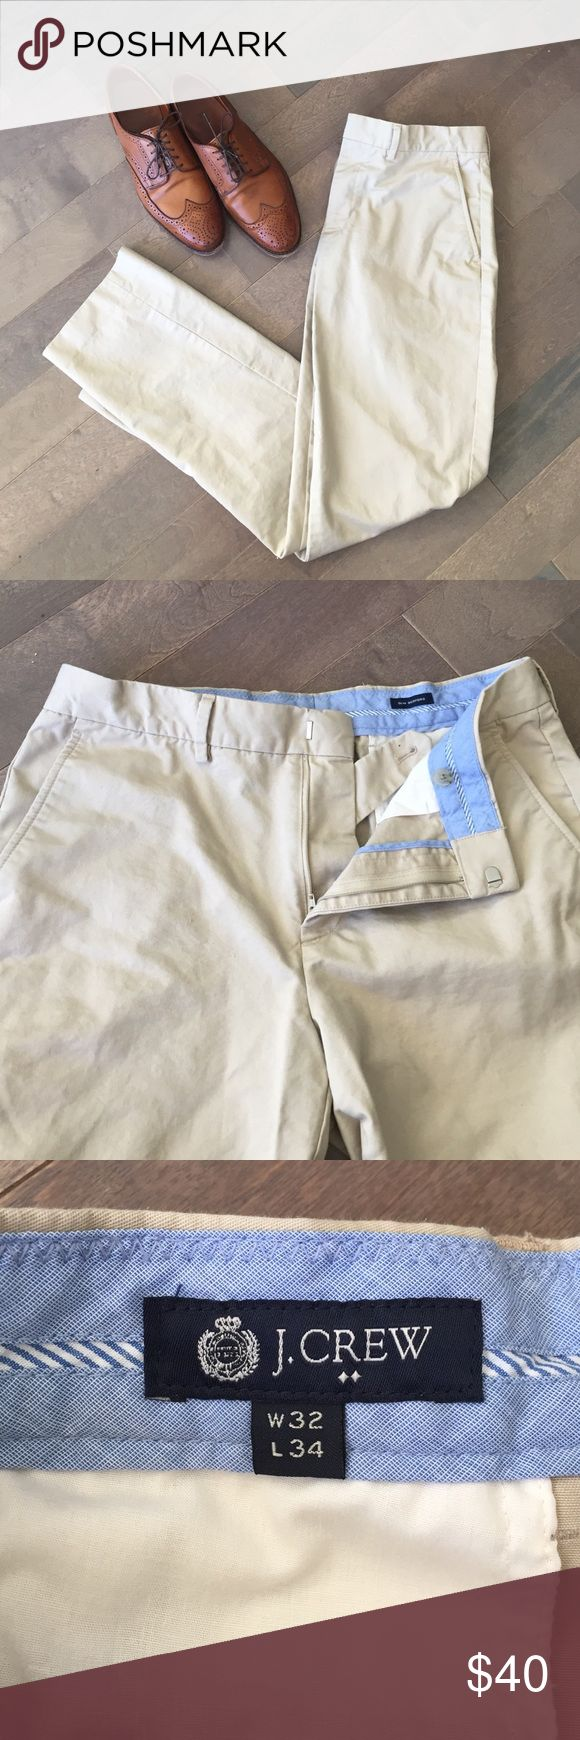 NWOT J. Crew Khaki Pants! NWOT men's khaki pants from J. Crew!  Slim Bedford style. Size: 32w x 34L J. Crew Pants Chinos & Khakis